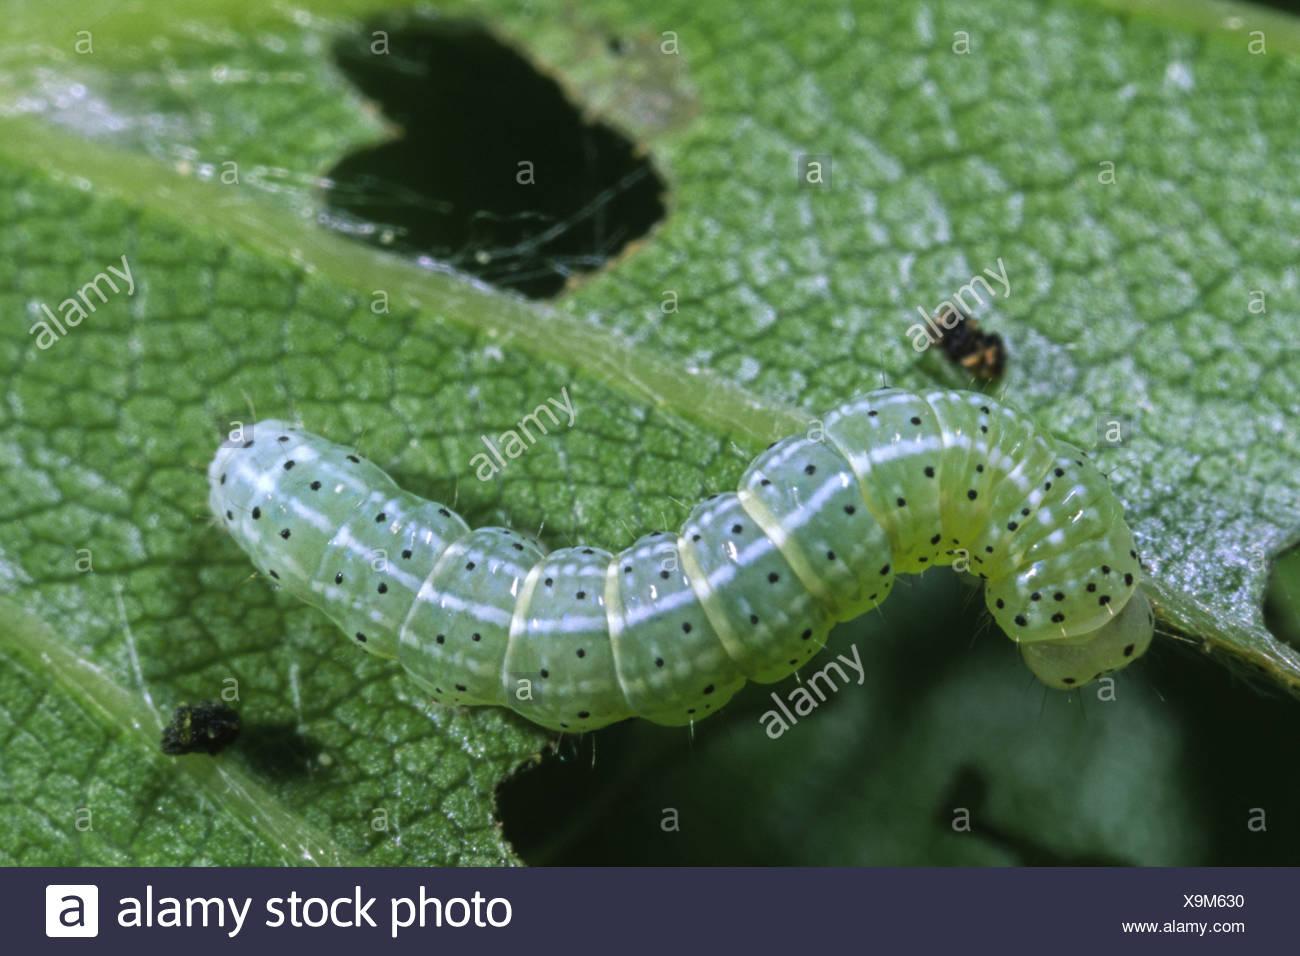 Orthosia gothica hebrew character larva larvae caterpillar insect bug nature natural wild wildlife environment environmental - Stock Image